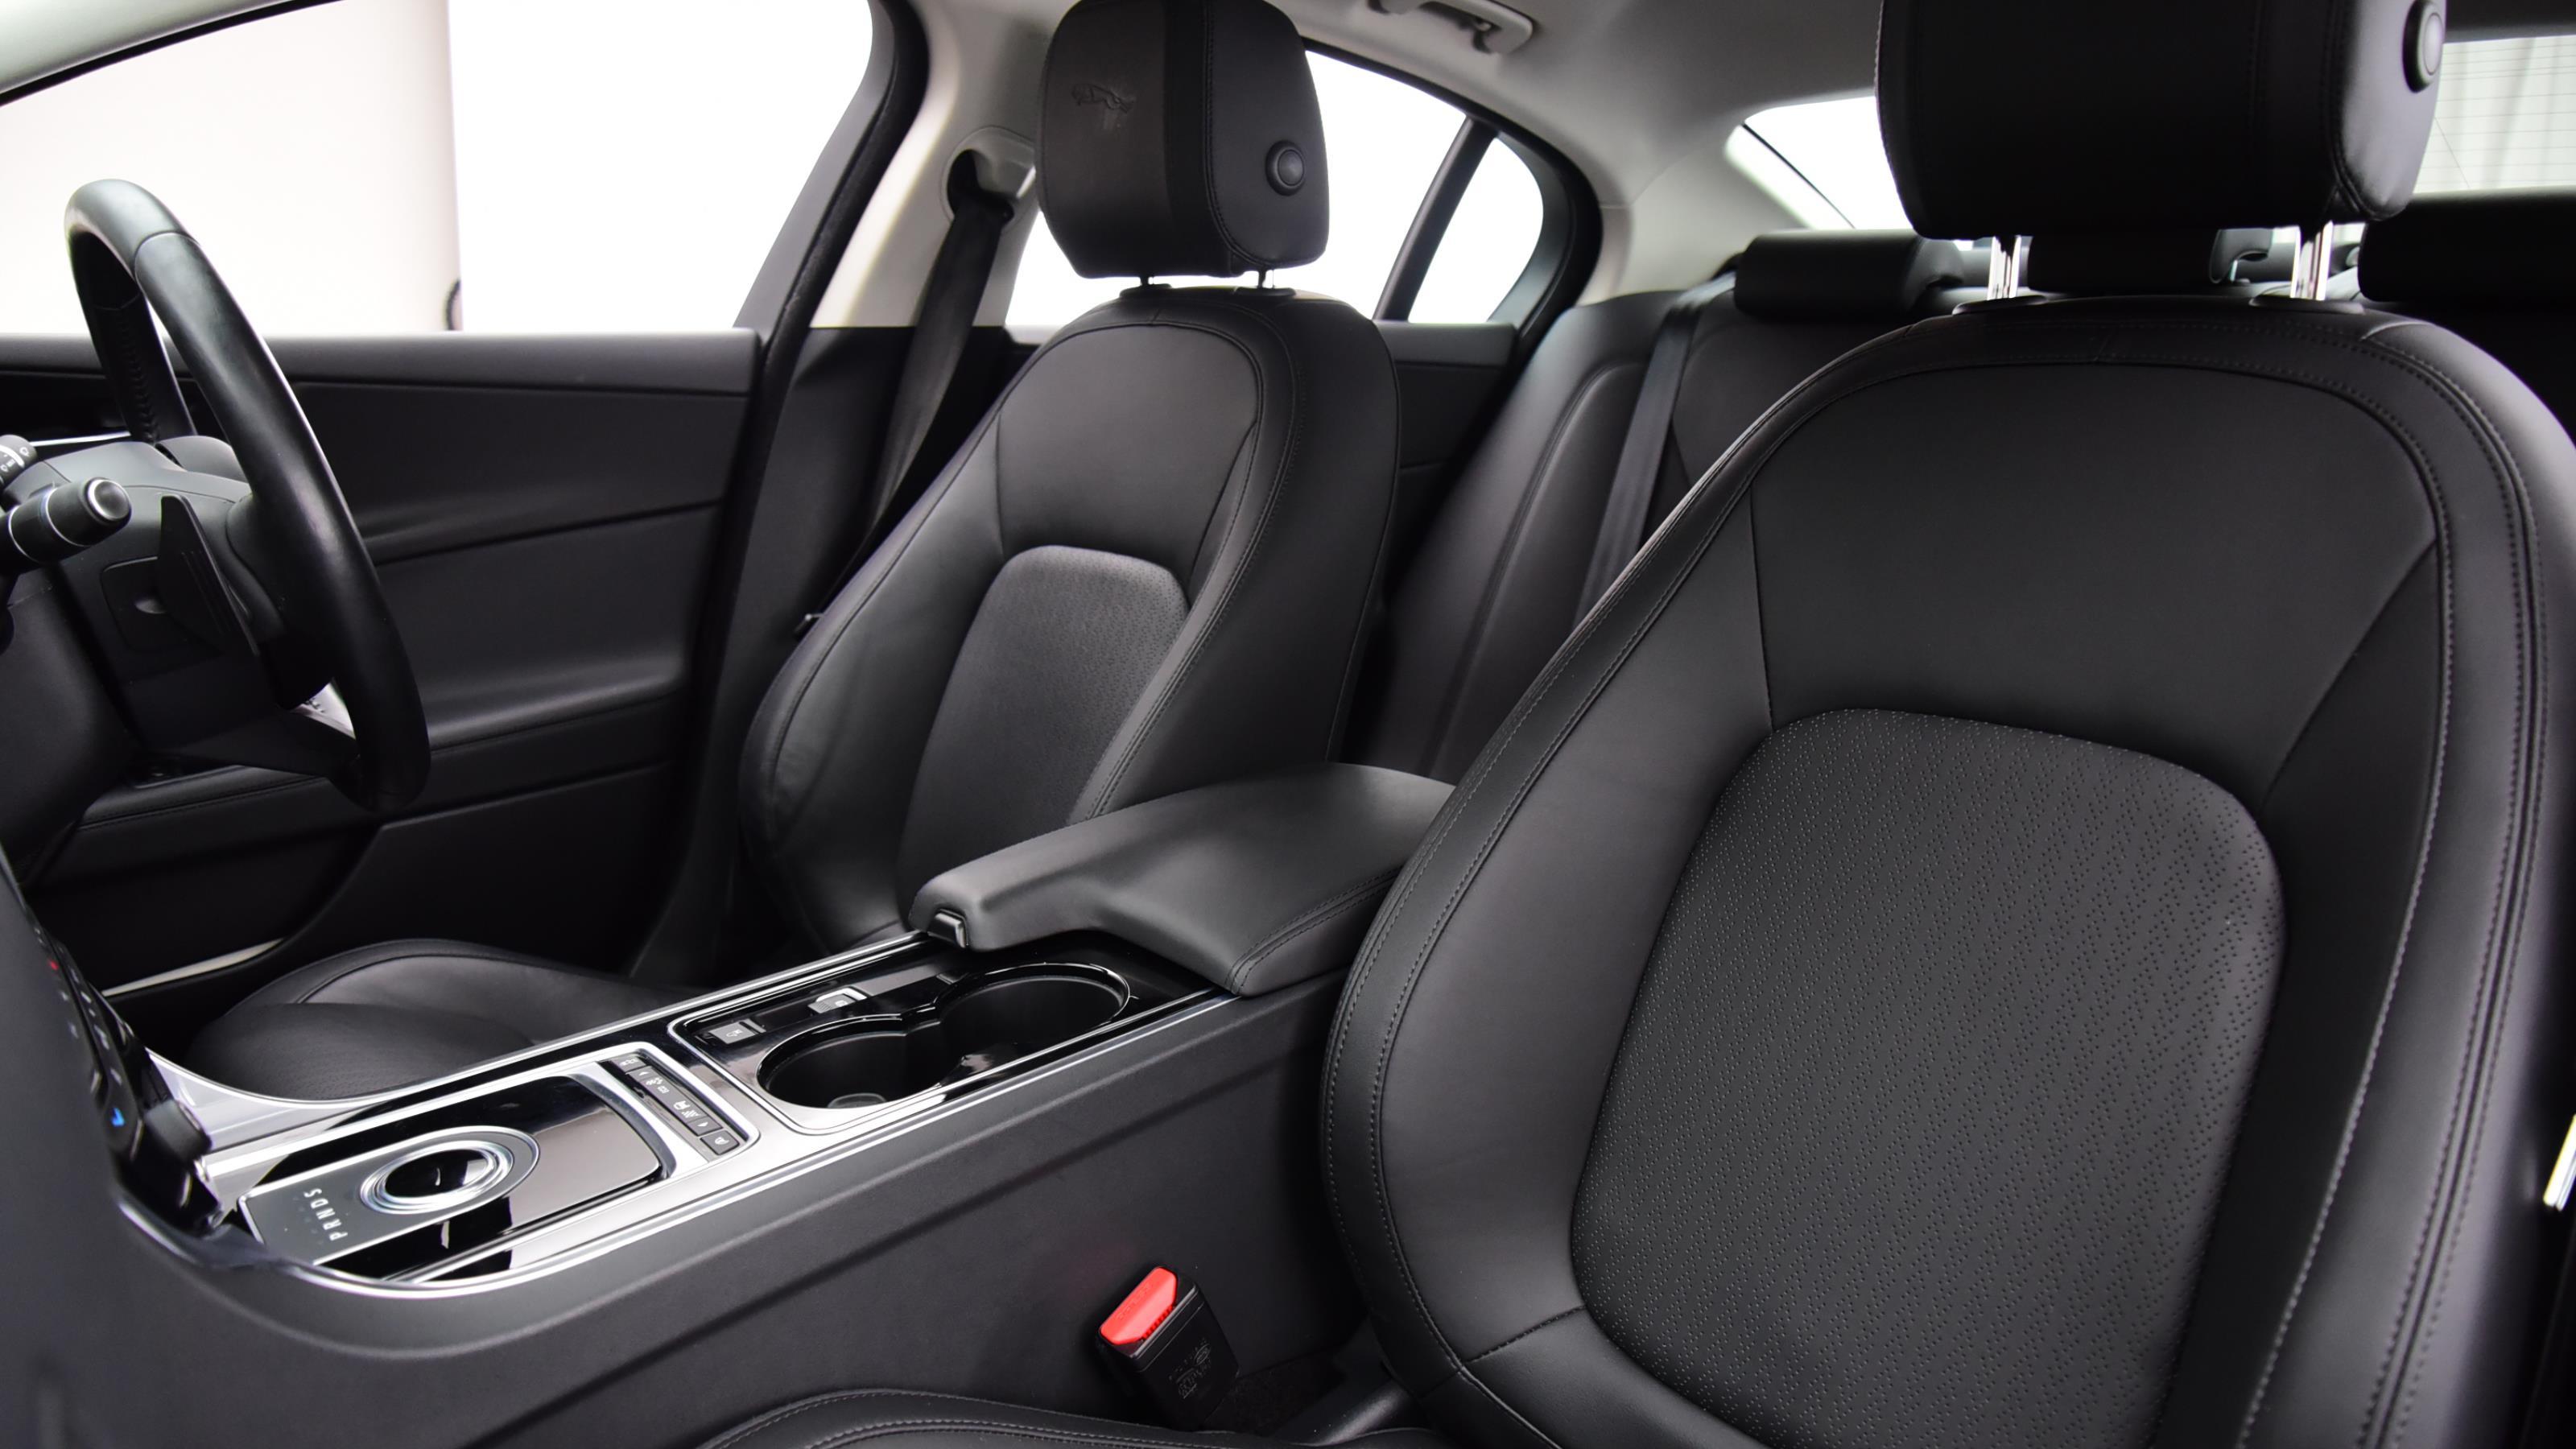 Used 15 Jaguar XE 2.0 [240] Portfolio 4dr Auto Red at Saxton4x4